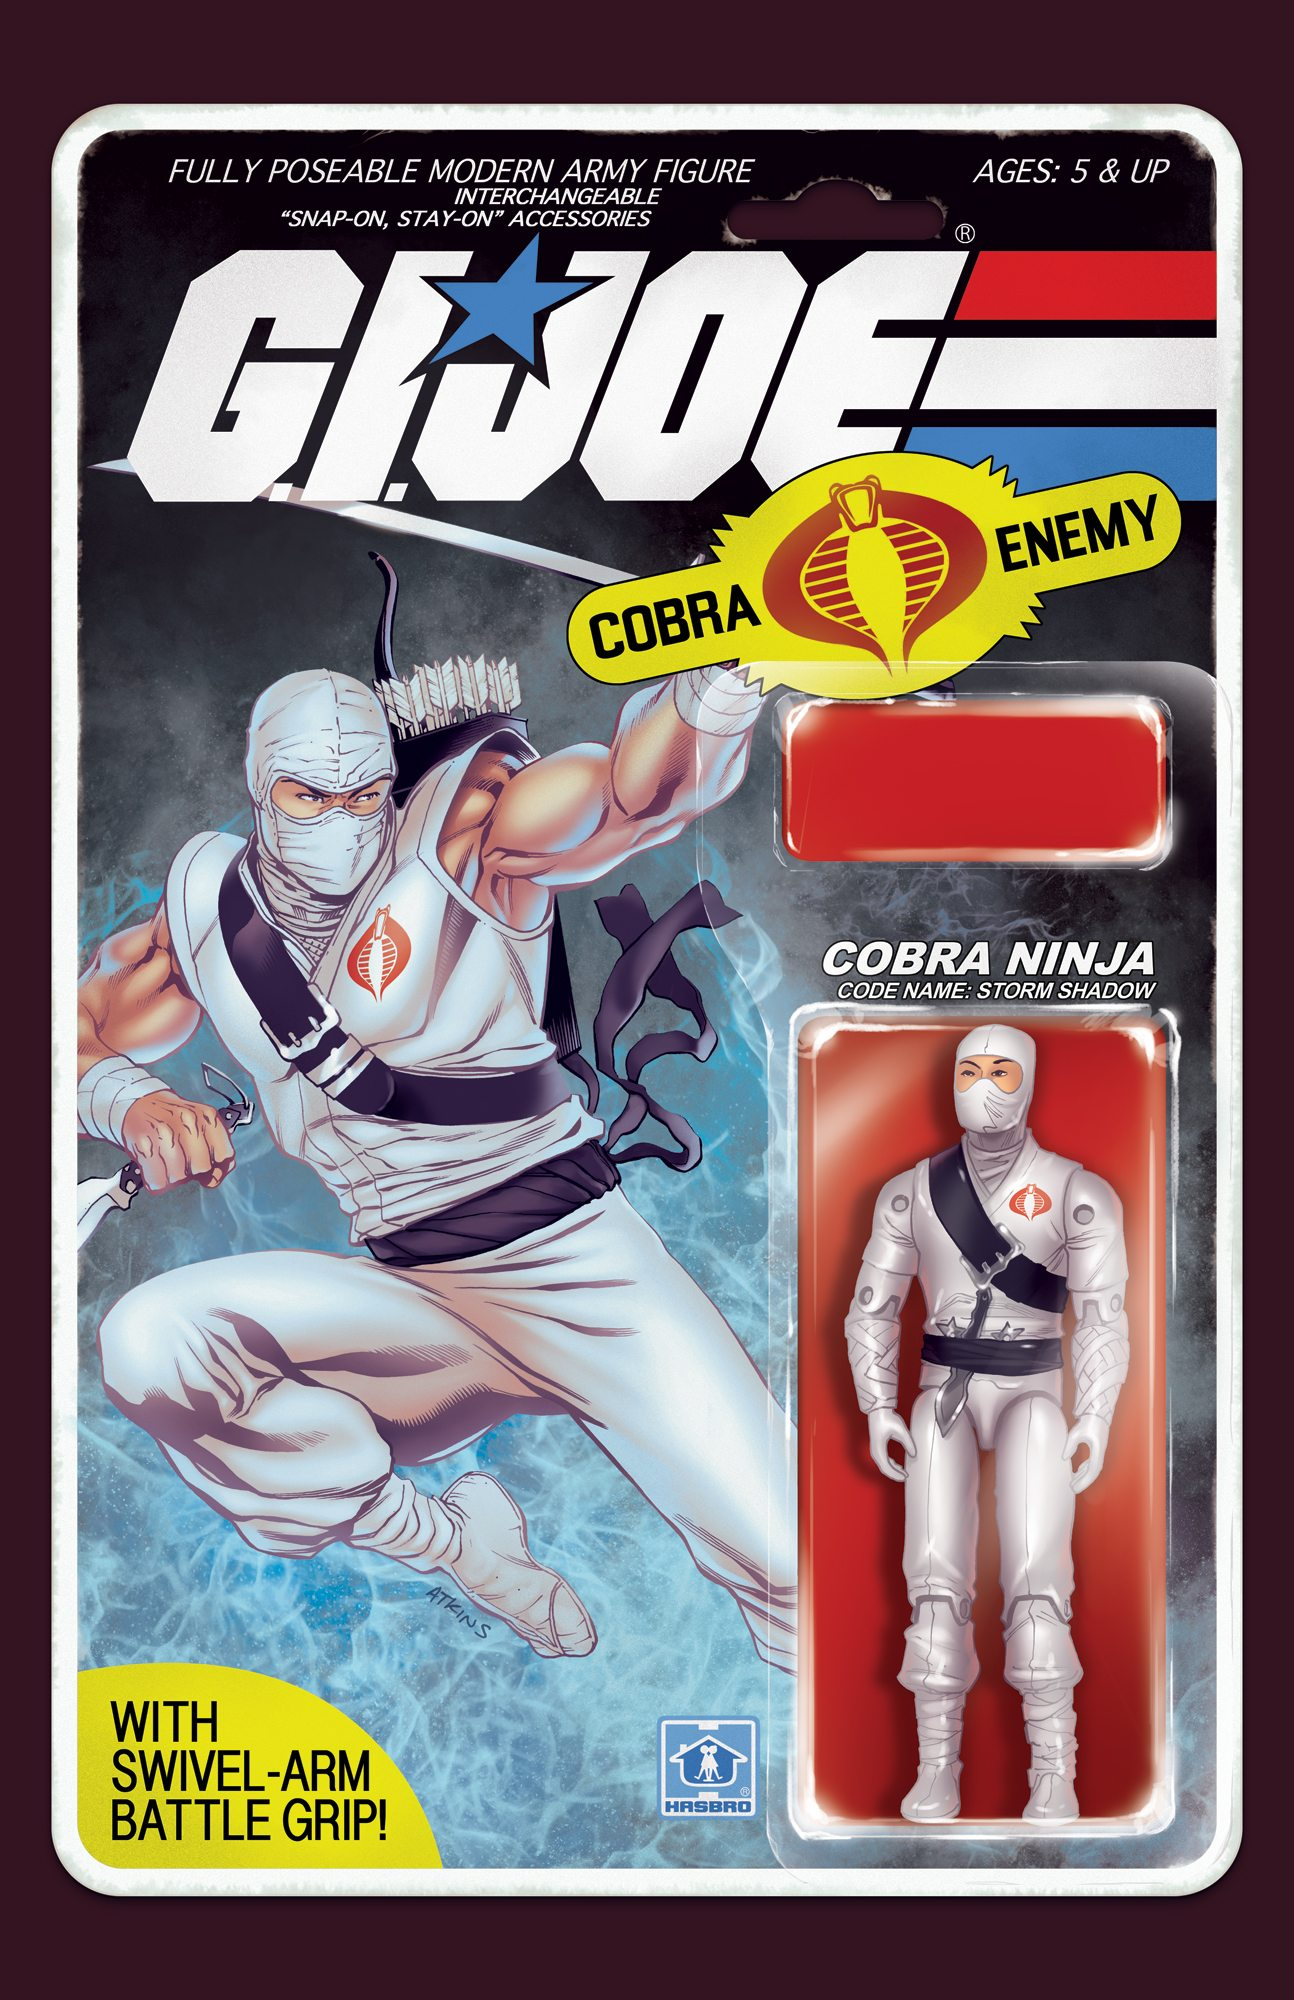 GI Joe: Real American Hero #217 Action Figure Cover